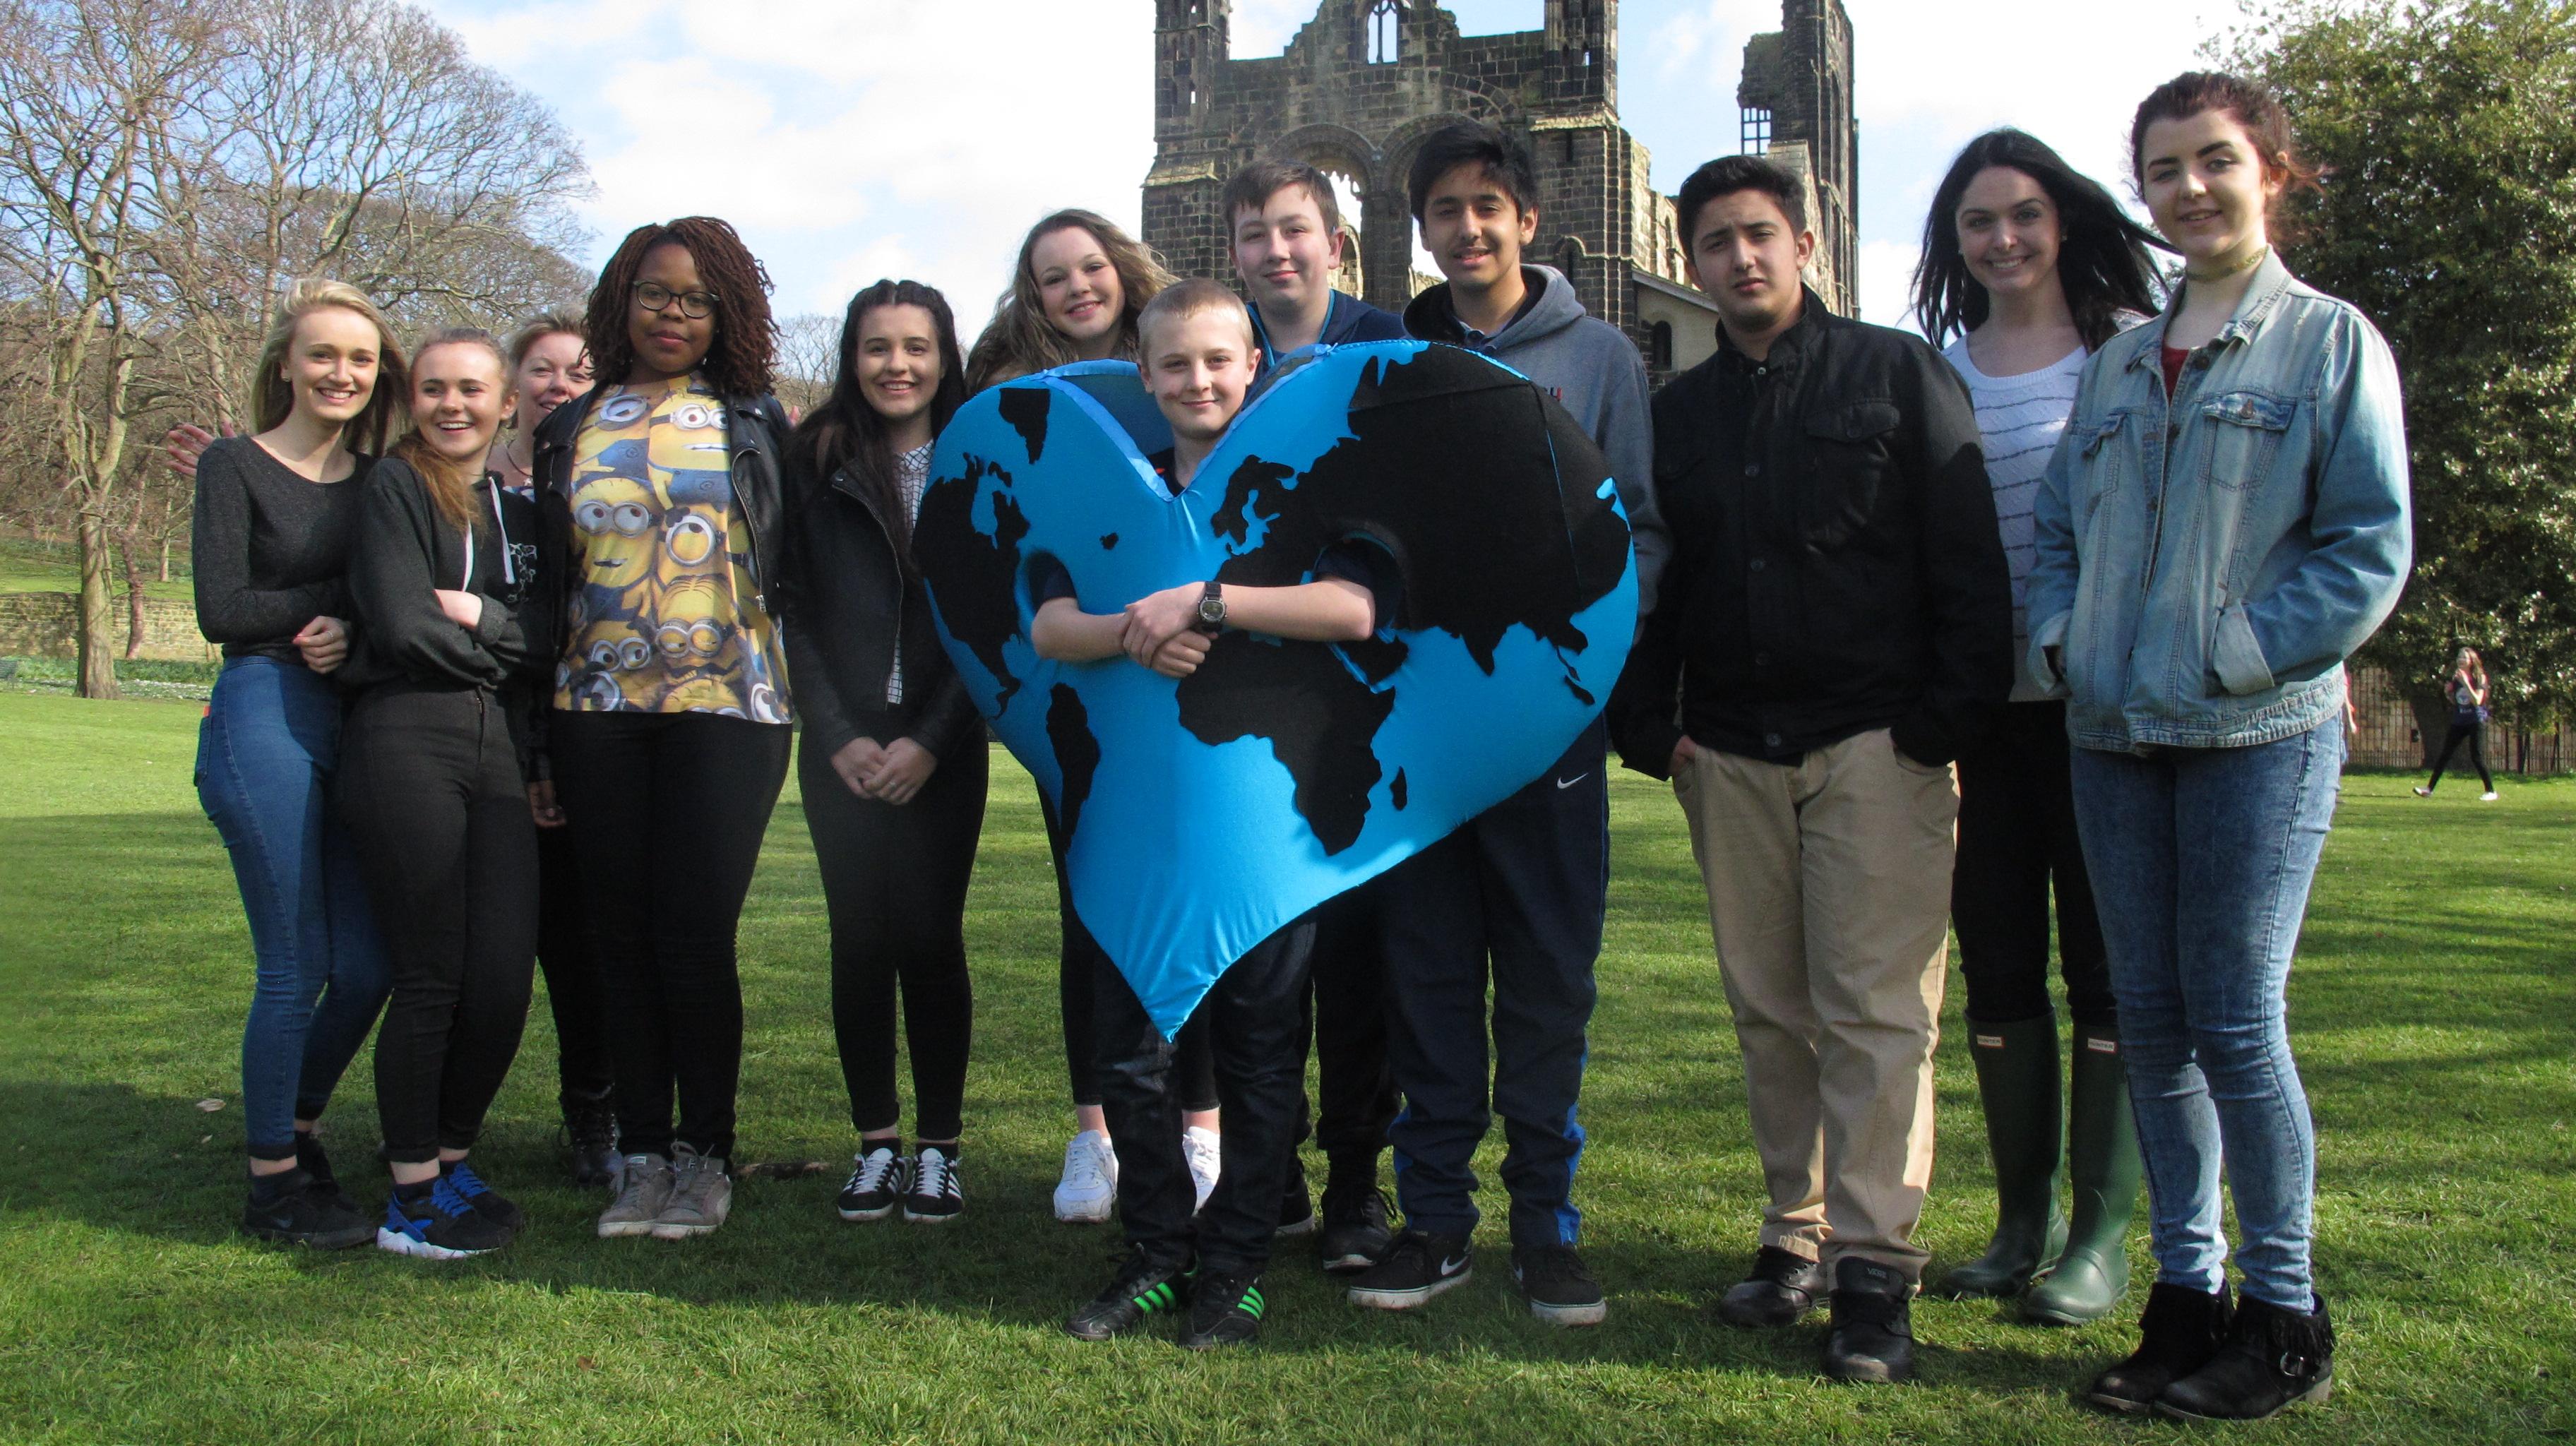 Leeds fundraising walk for CAFOD